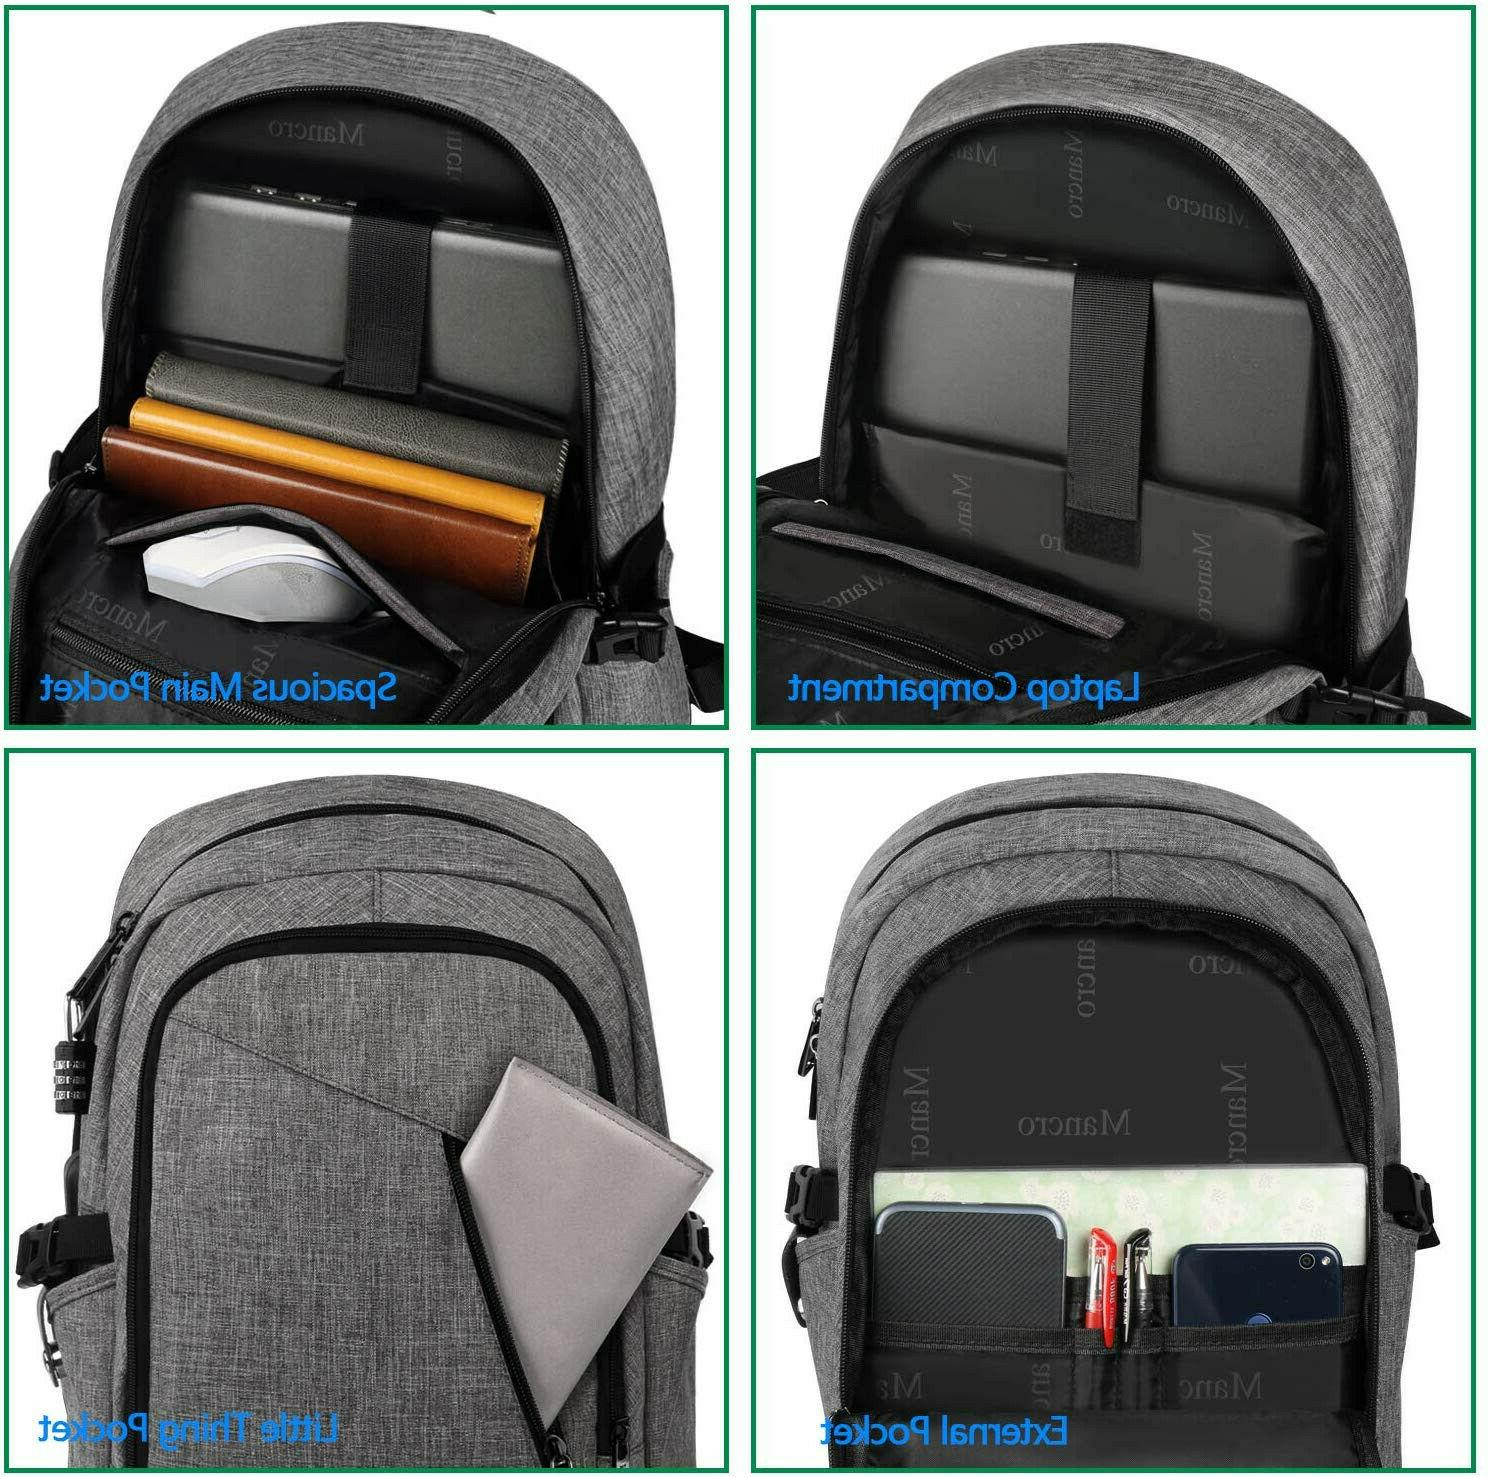 Mancro Computer USB Charging Port Fits Notebook